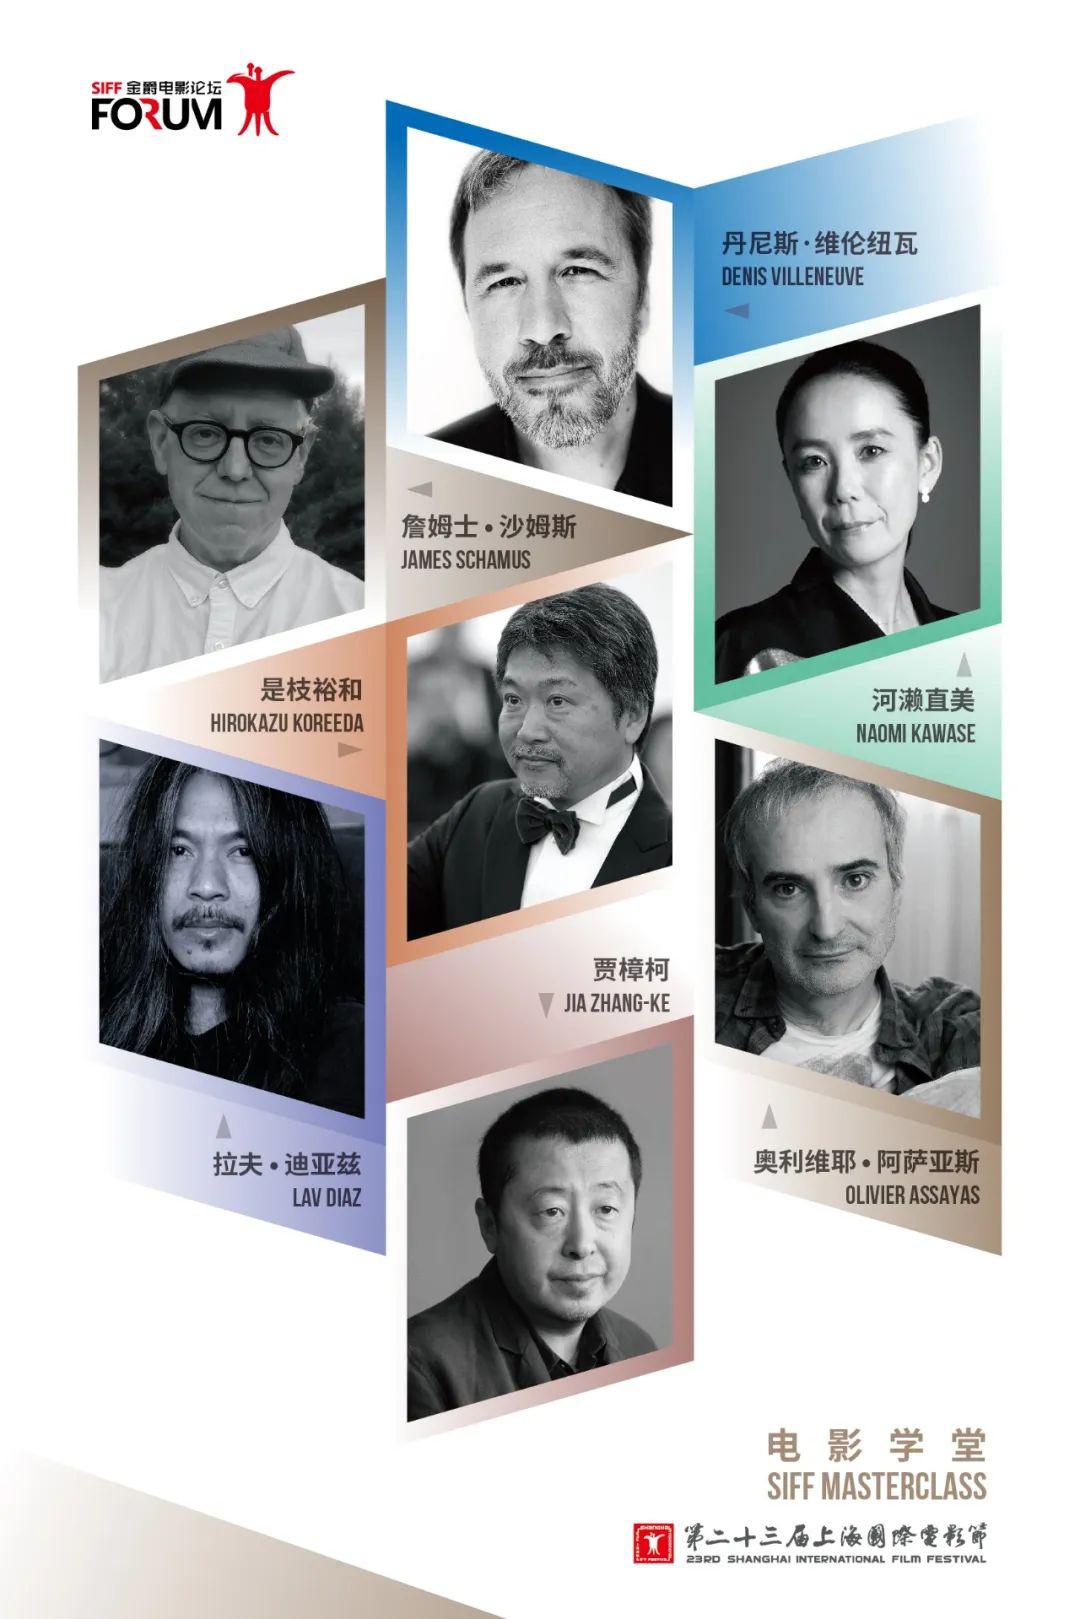 allbet开户:上海电影节宣布大师班嘉宾阵容 贾樟柯徐峥等出席 第1张